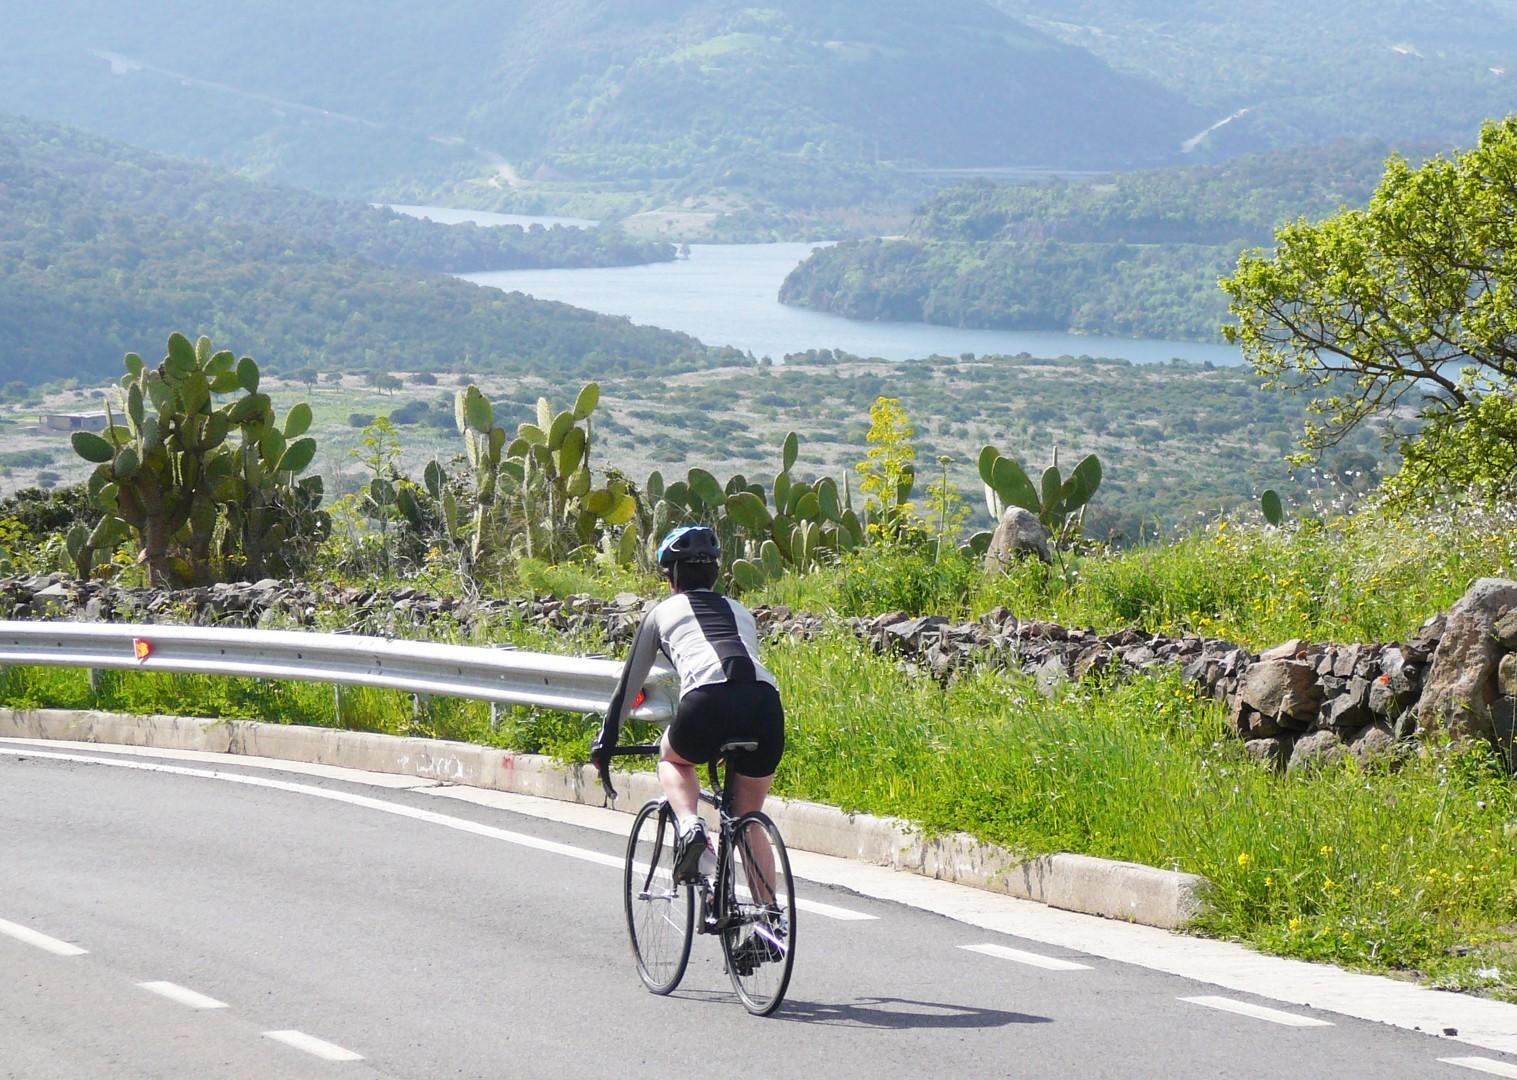 Self-Guided-Road-Cycling-Holiday-Coastal-Explorer-Sardinia.JPG - Italy - Net Trade Rate - Coastal TranSardinia - Self-Guided Road Cycling Holiday - Italia Road Cycling